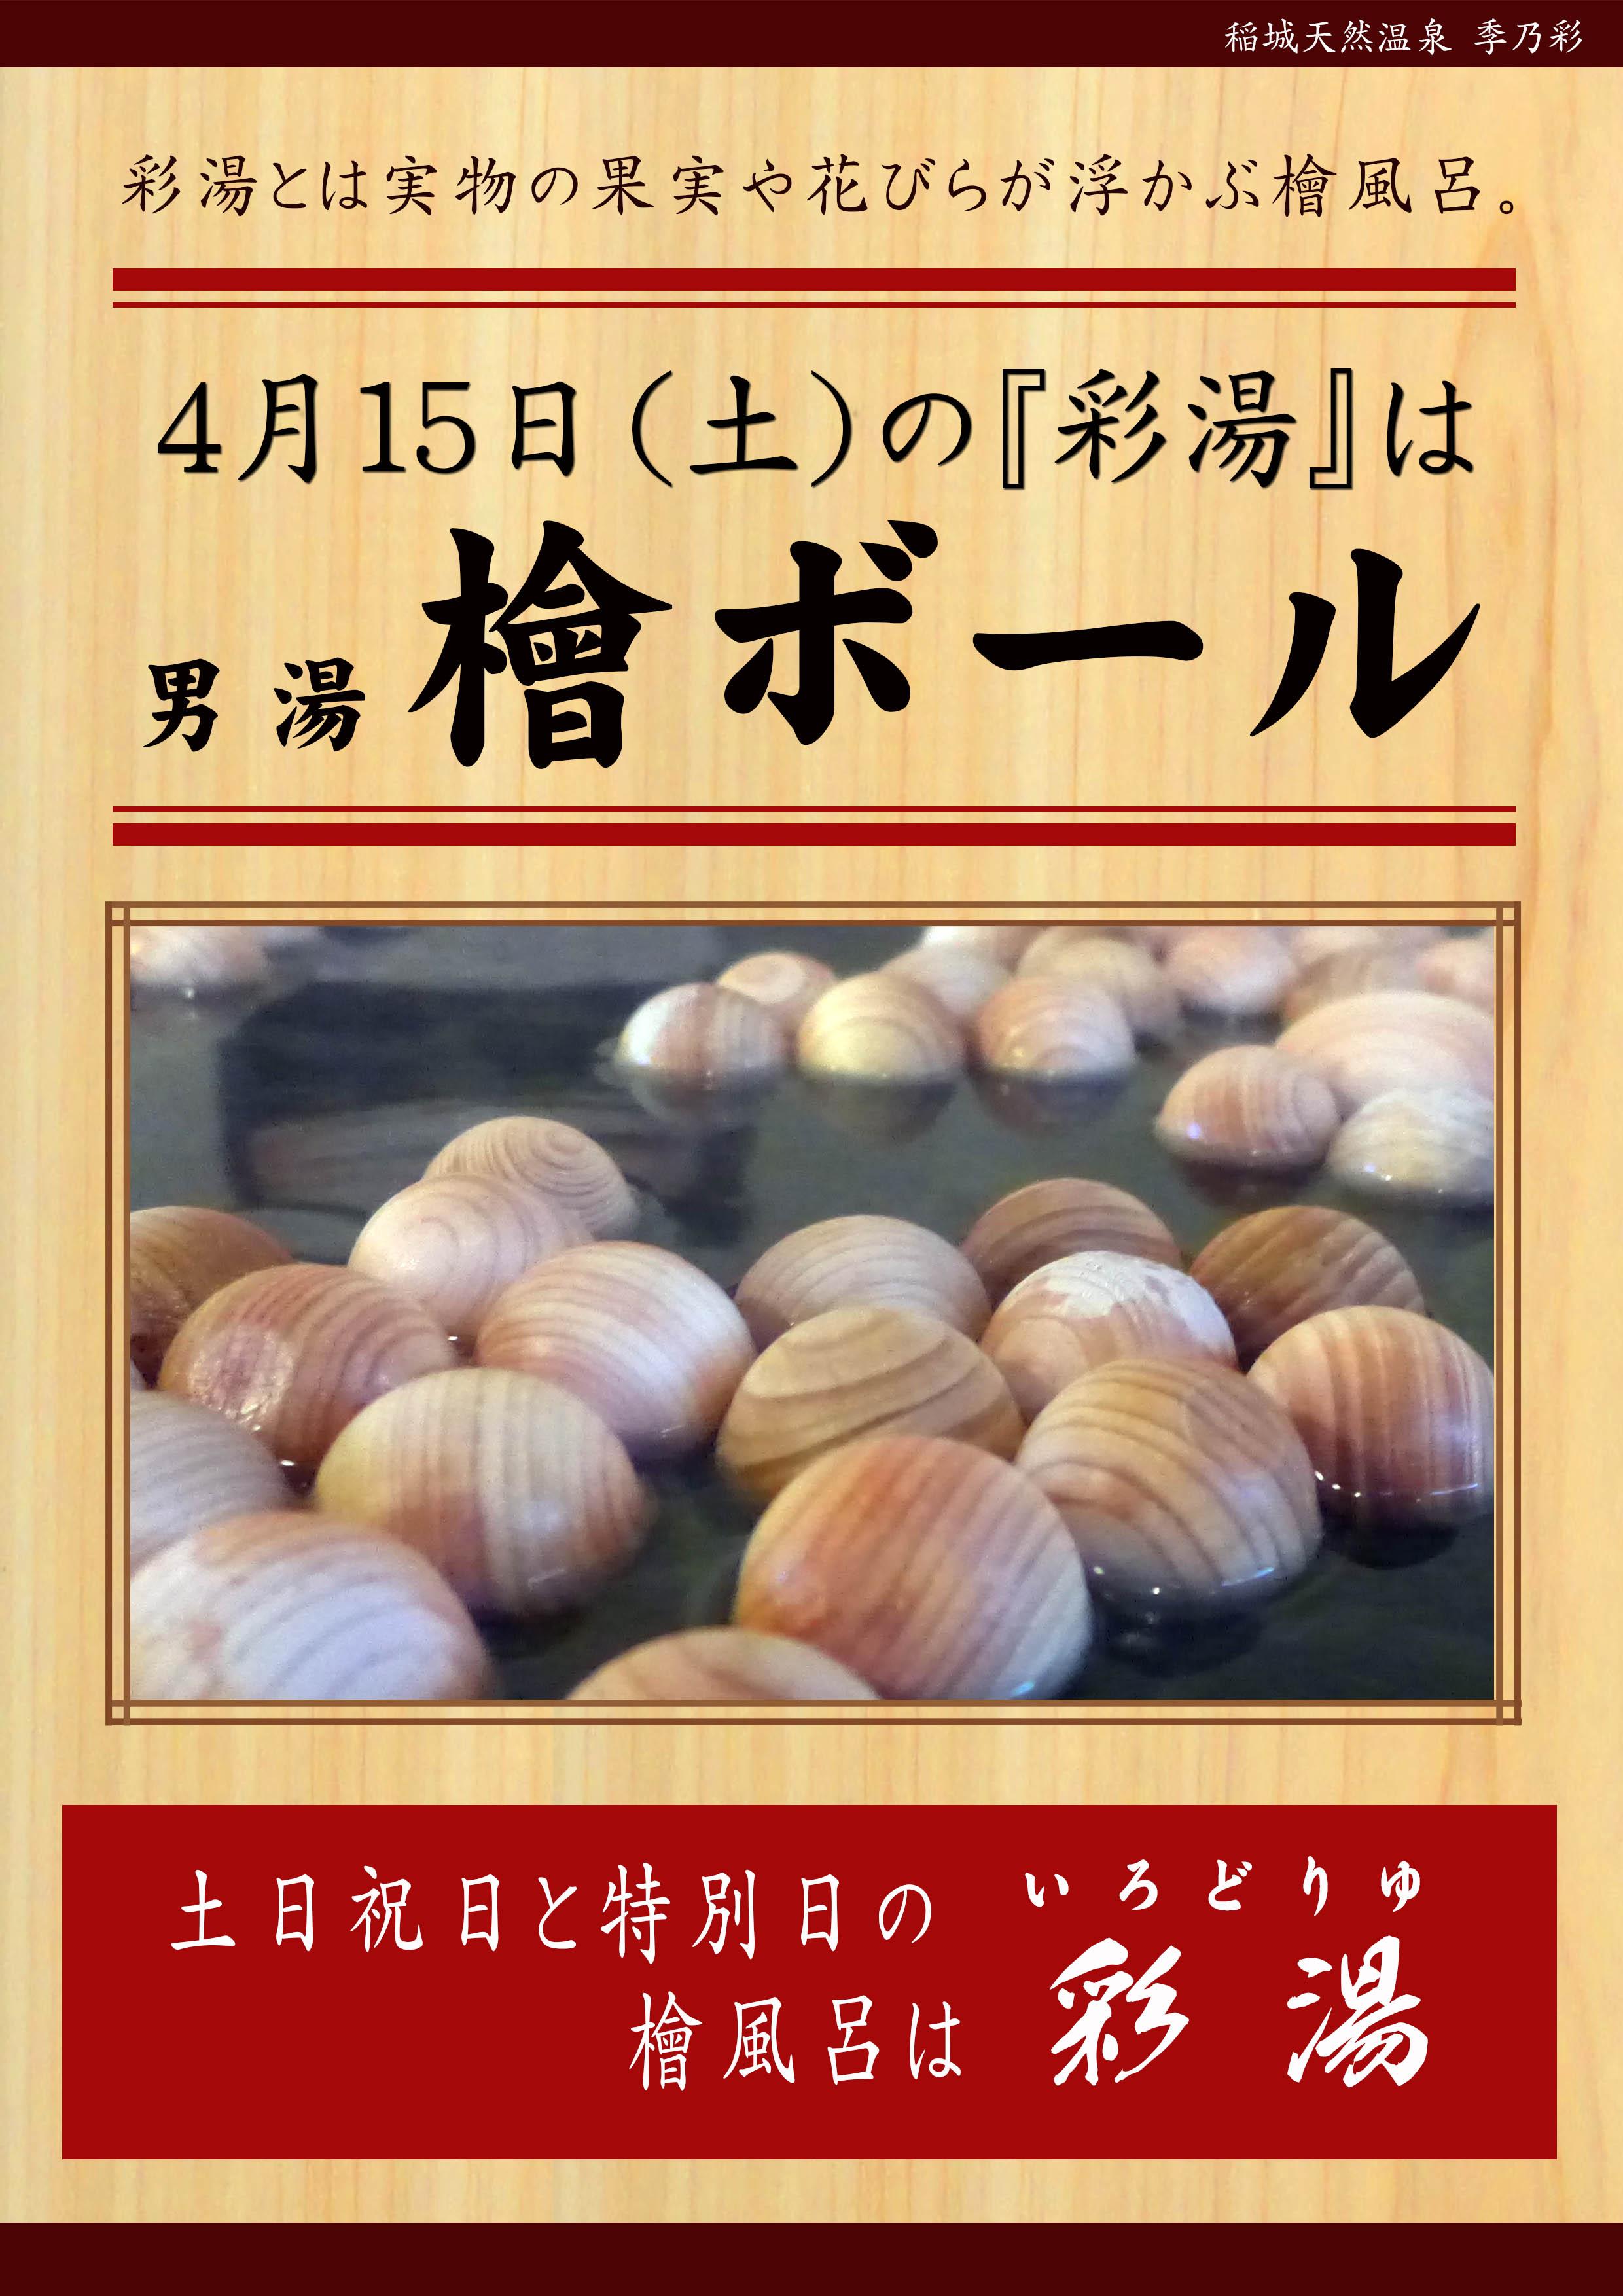 20170415POP イベント 彩湯 男湯 檜ボール